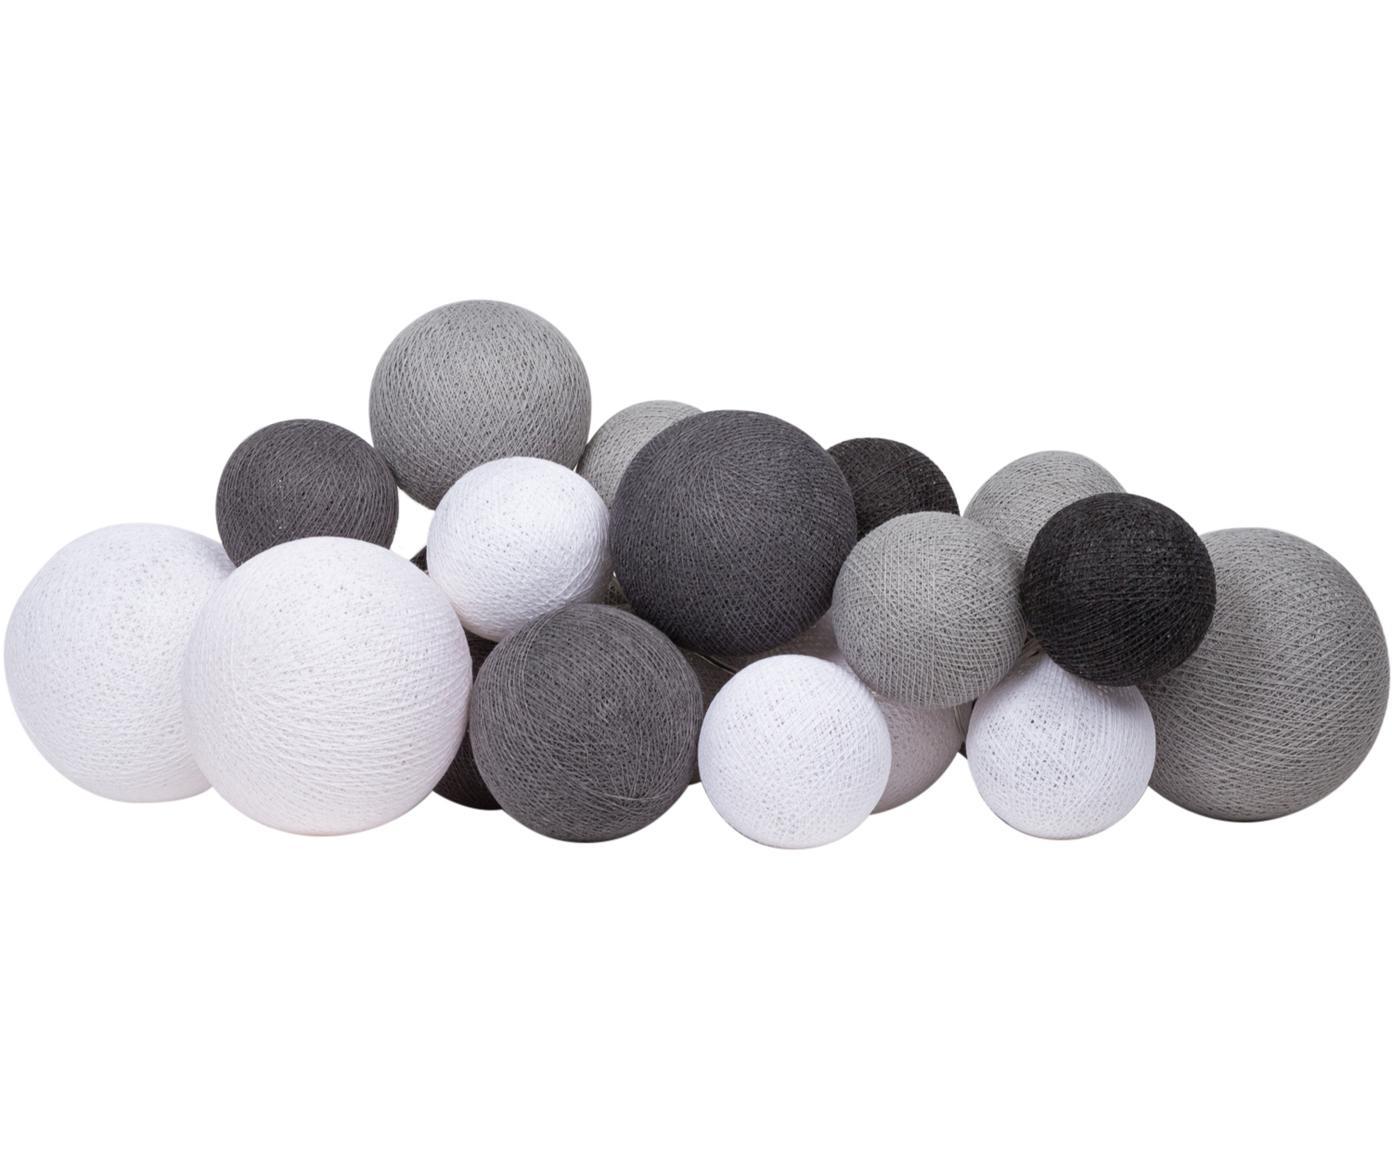 LED Lichterkette Moodi, Lampions: Polyester, Grautöne, Weiß, L 264 cm